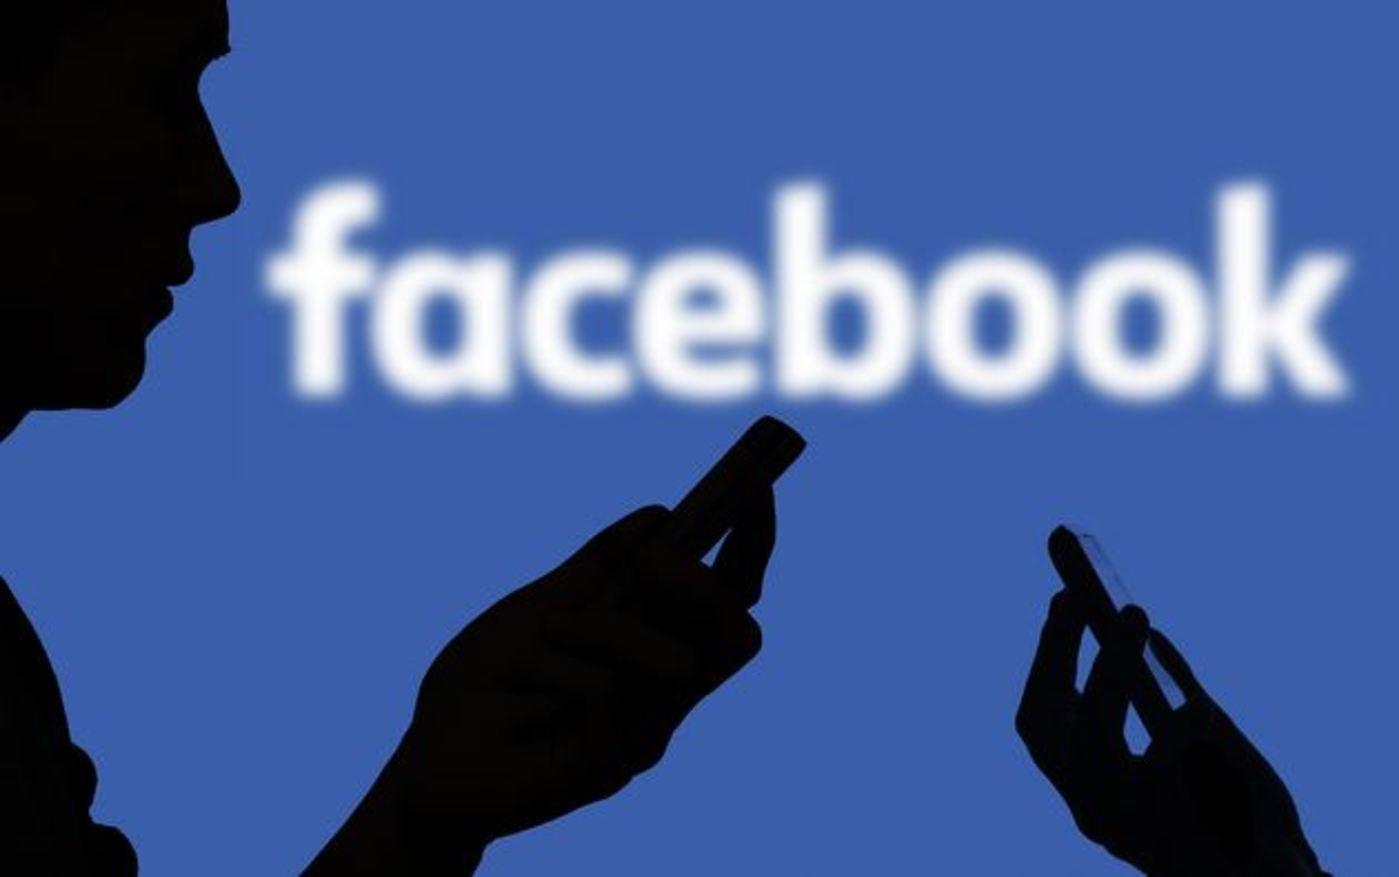 Facebook宣布元宇宙相关主管晋升CTO,推动AR、VR硬件研发与升级